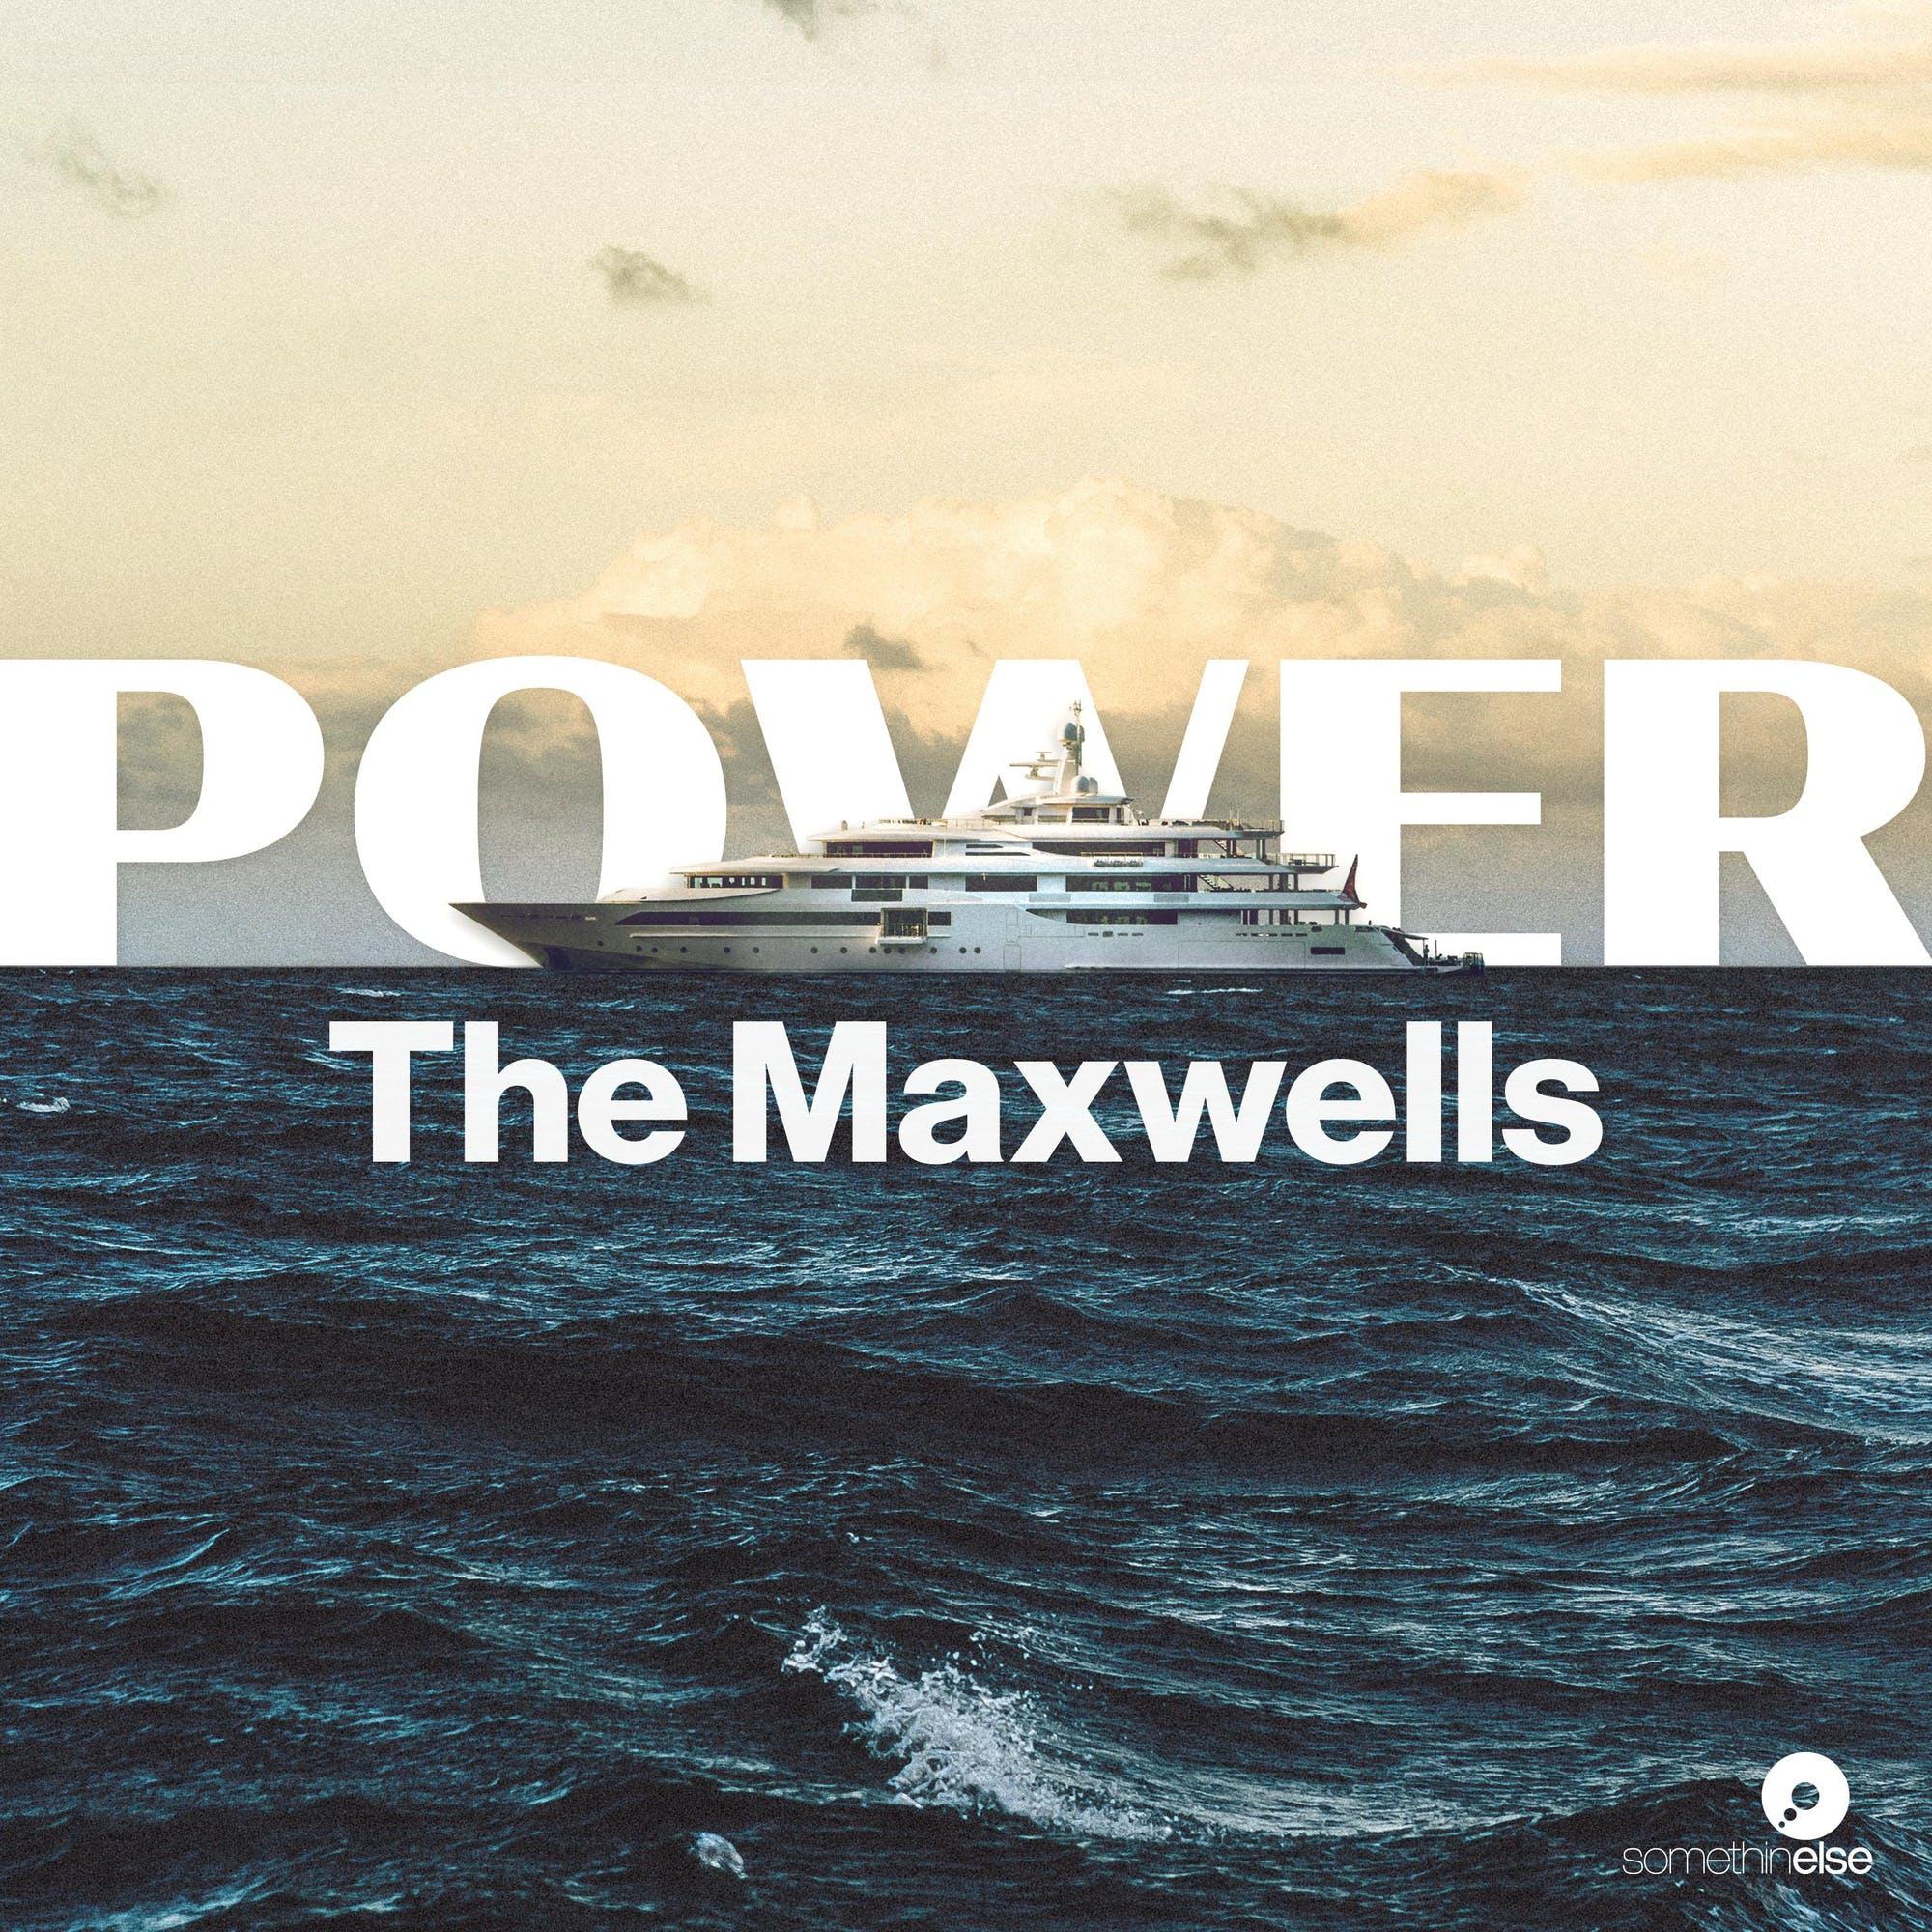 Power: The Maxwells